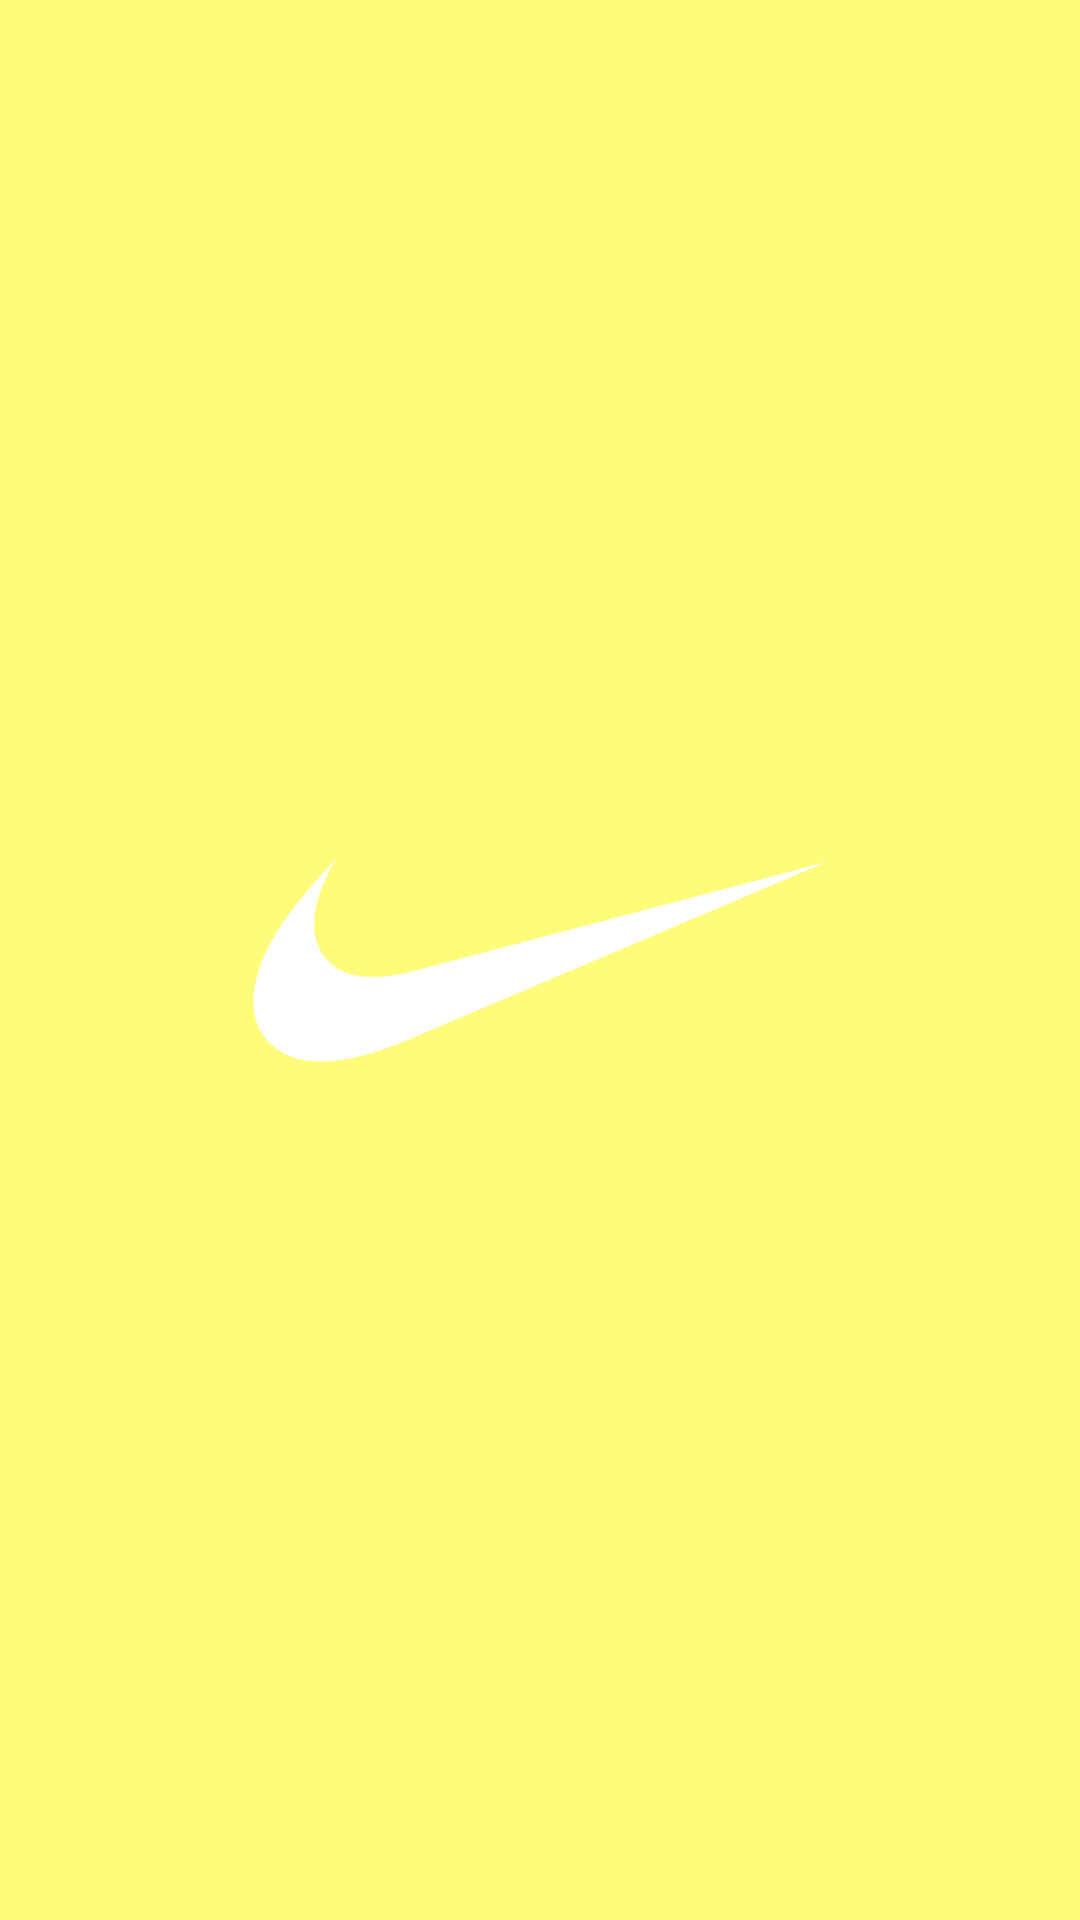 Bts Quotes Wallpaper Iphone Hd ナイキロゴ Nike Logo15 Iphone壁紙 ただひたすらiphoneの壁紙が集まるサイト